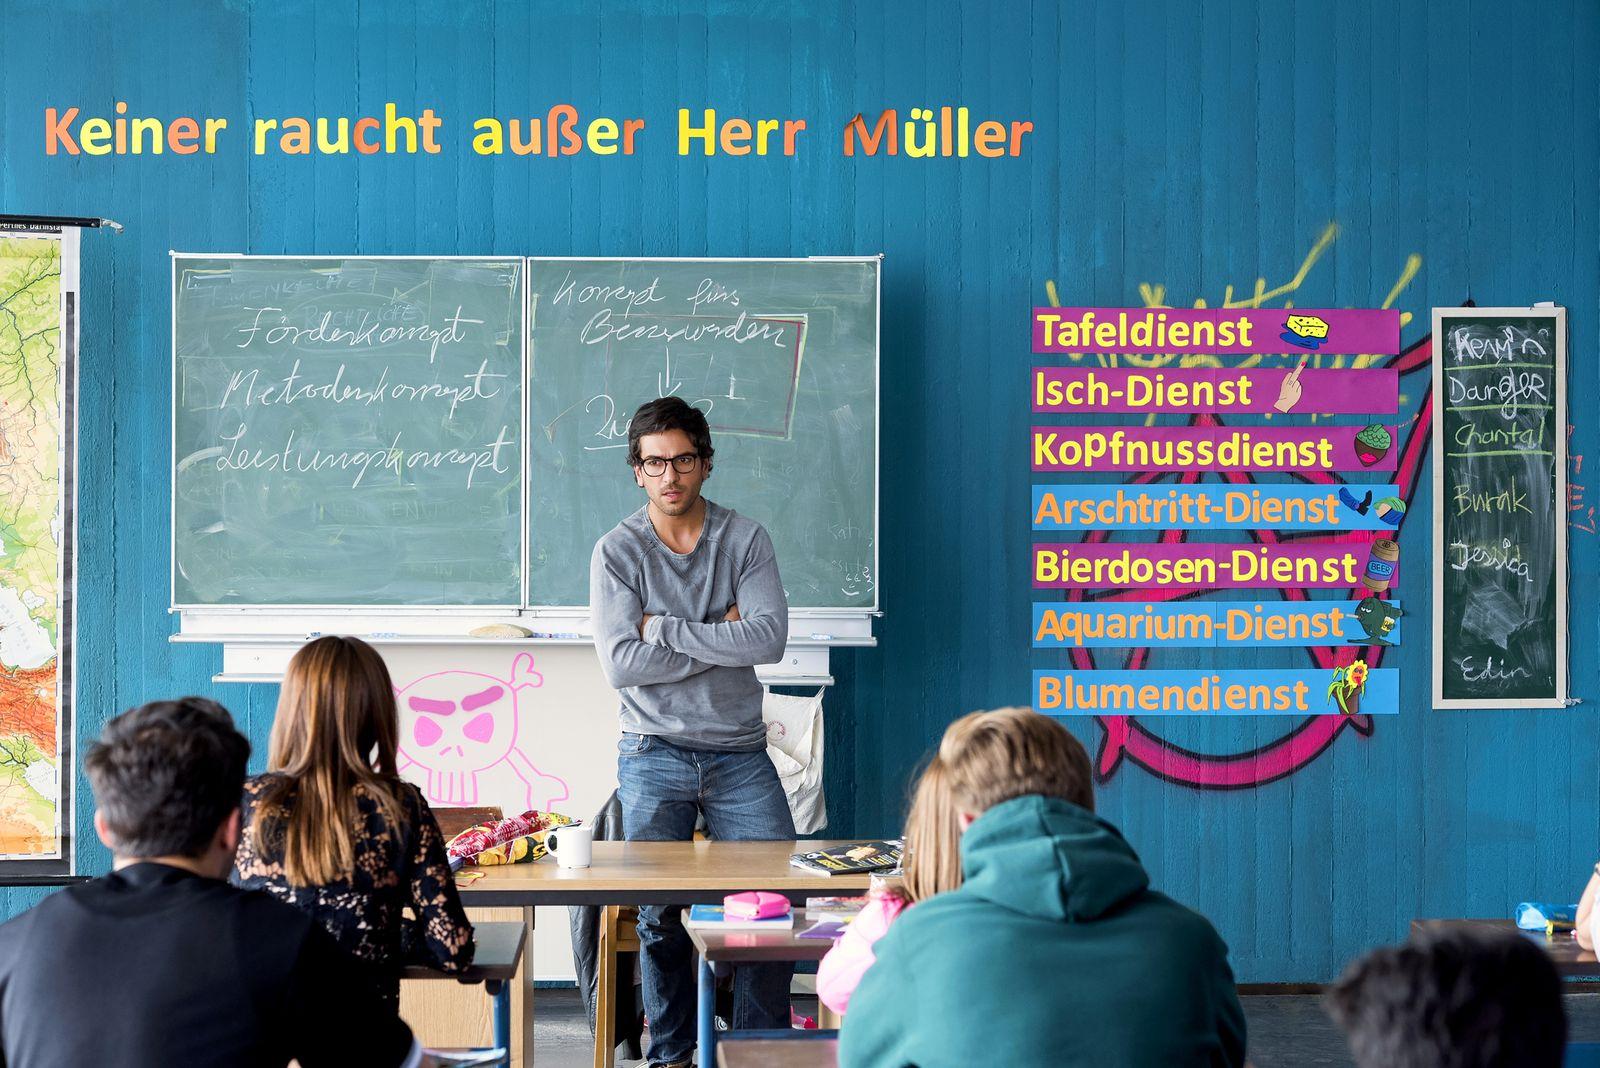 EINMALIGE VERWENDUNG Film/ Fack Ju Göhte 2/ plus